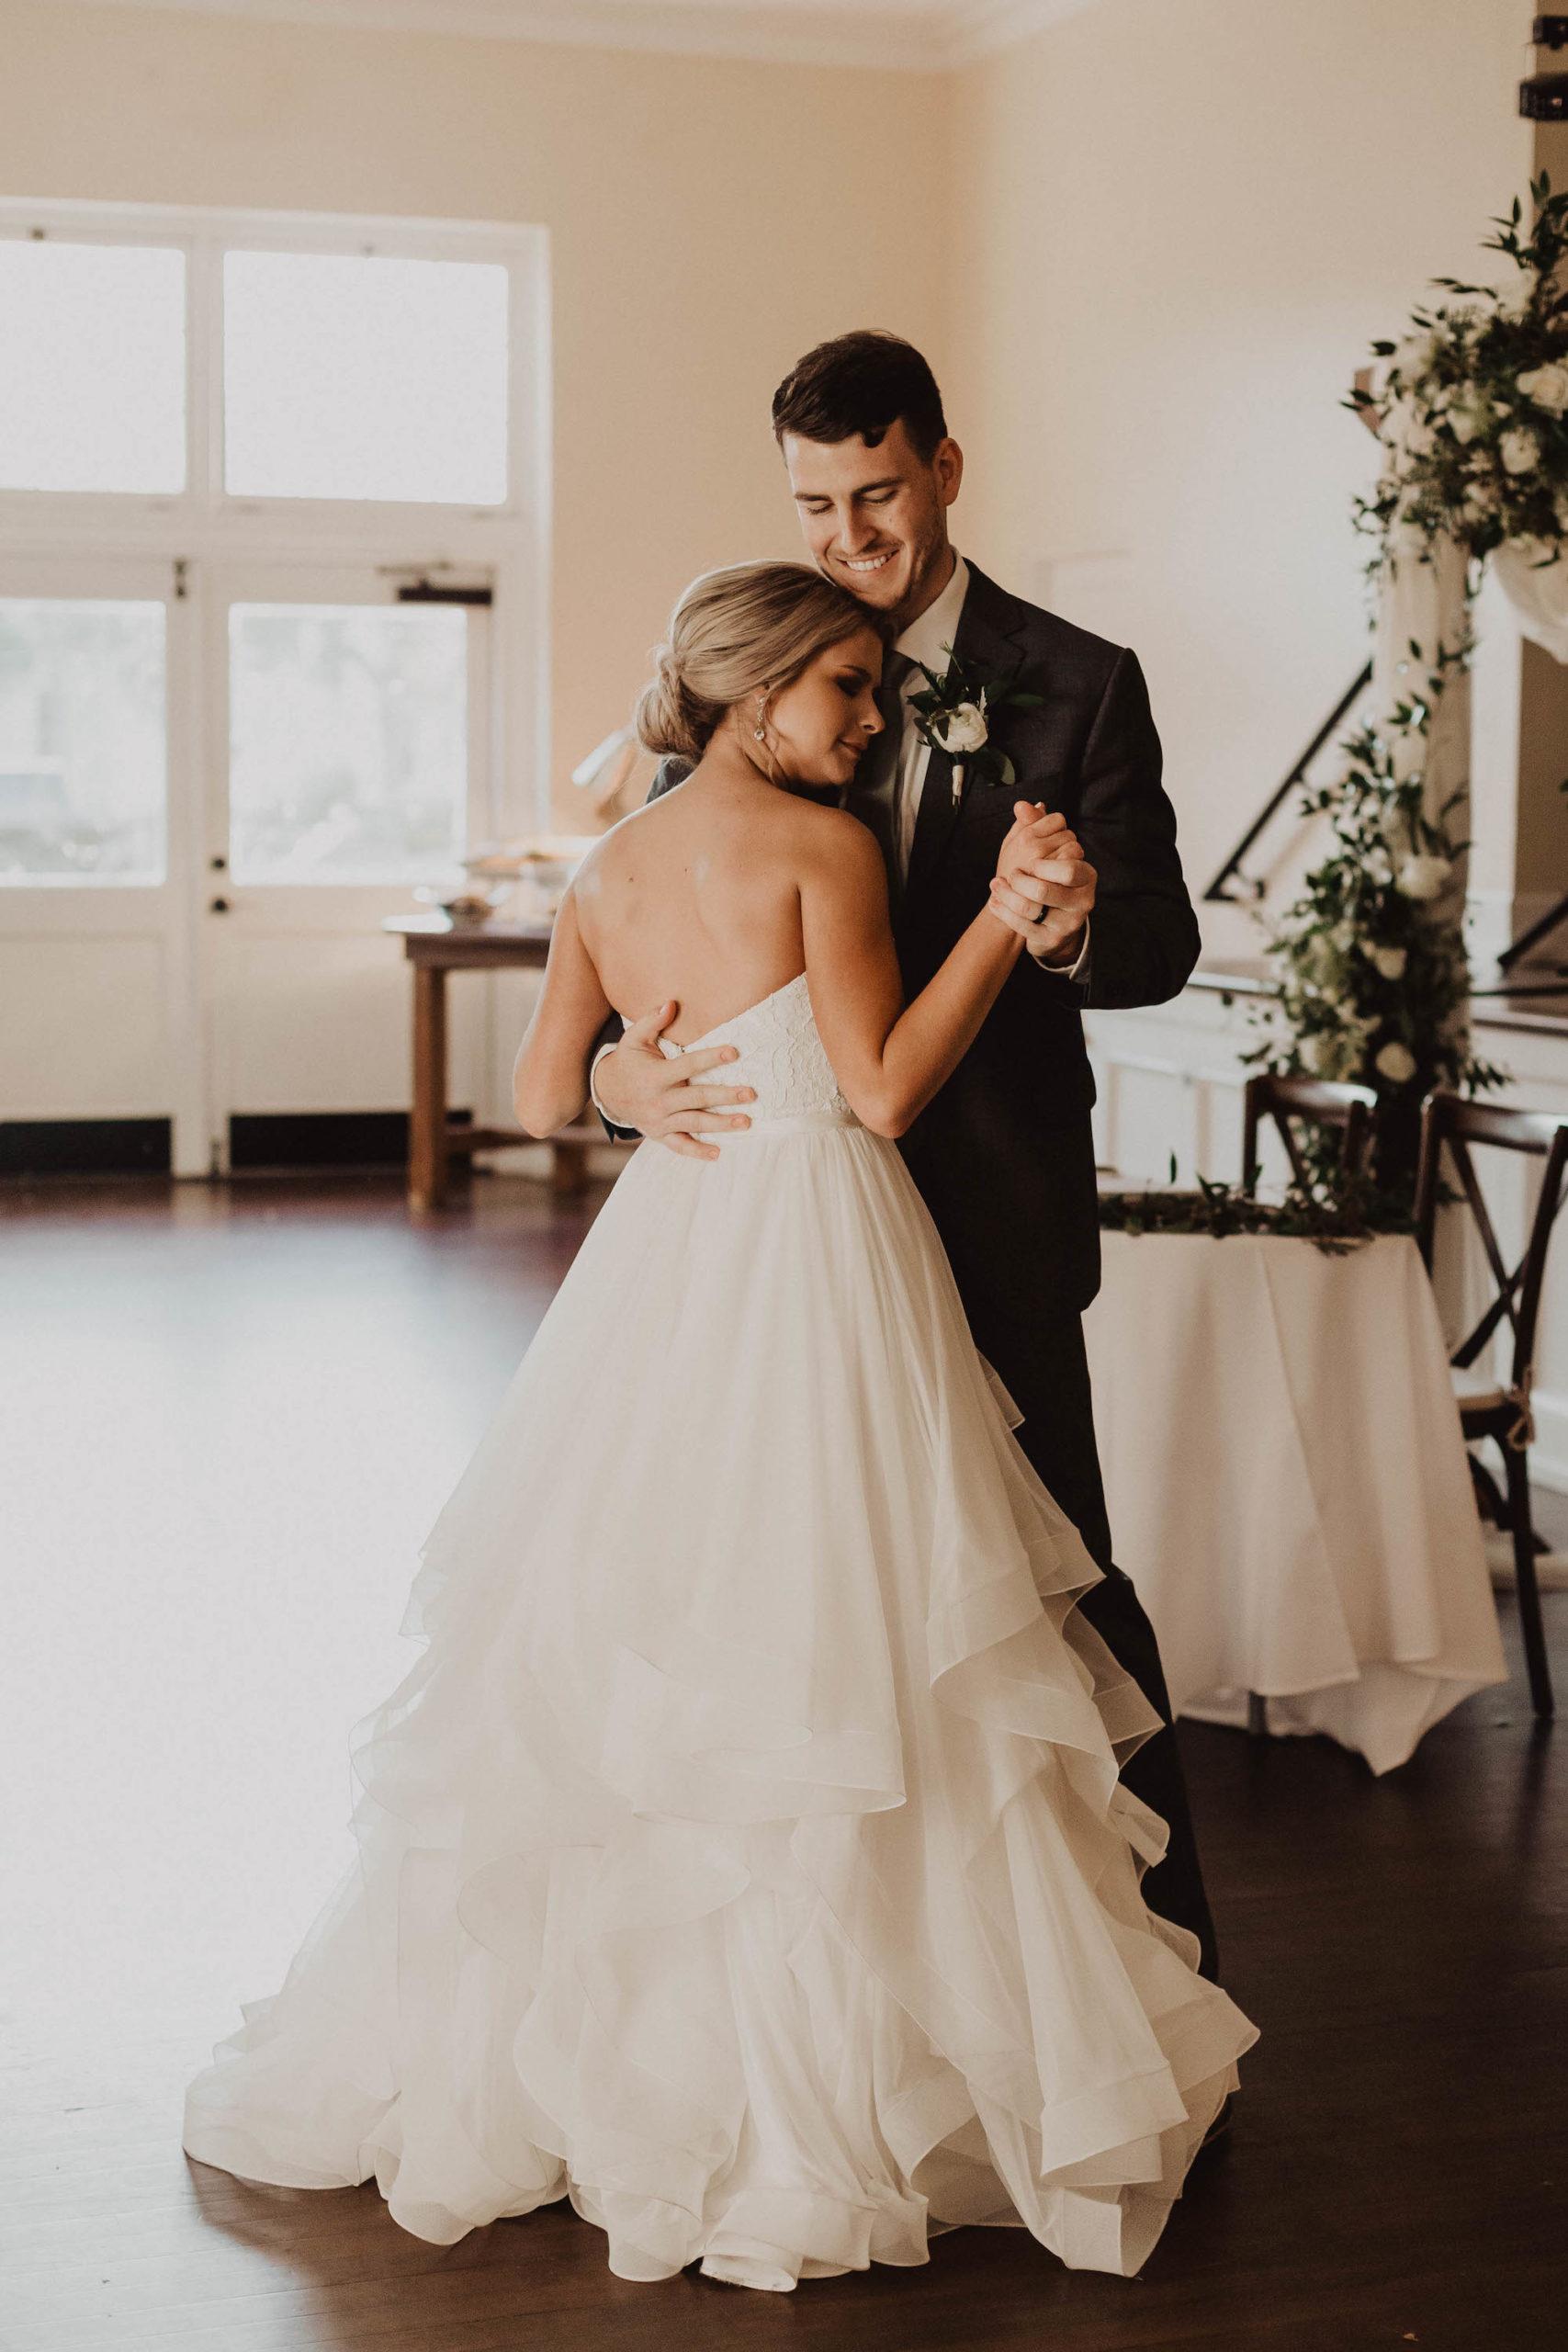 Romantic Bride and Groom First Dance Wedding Reception Portrait